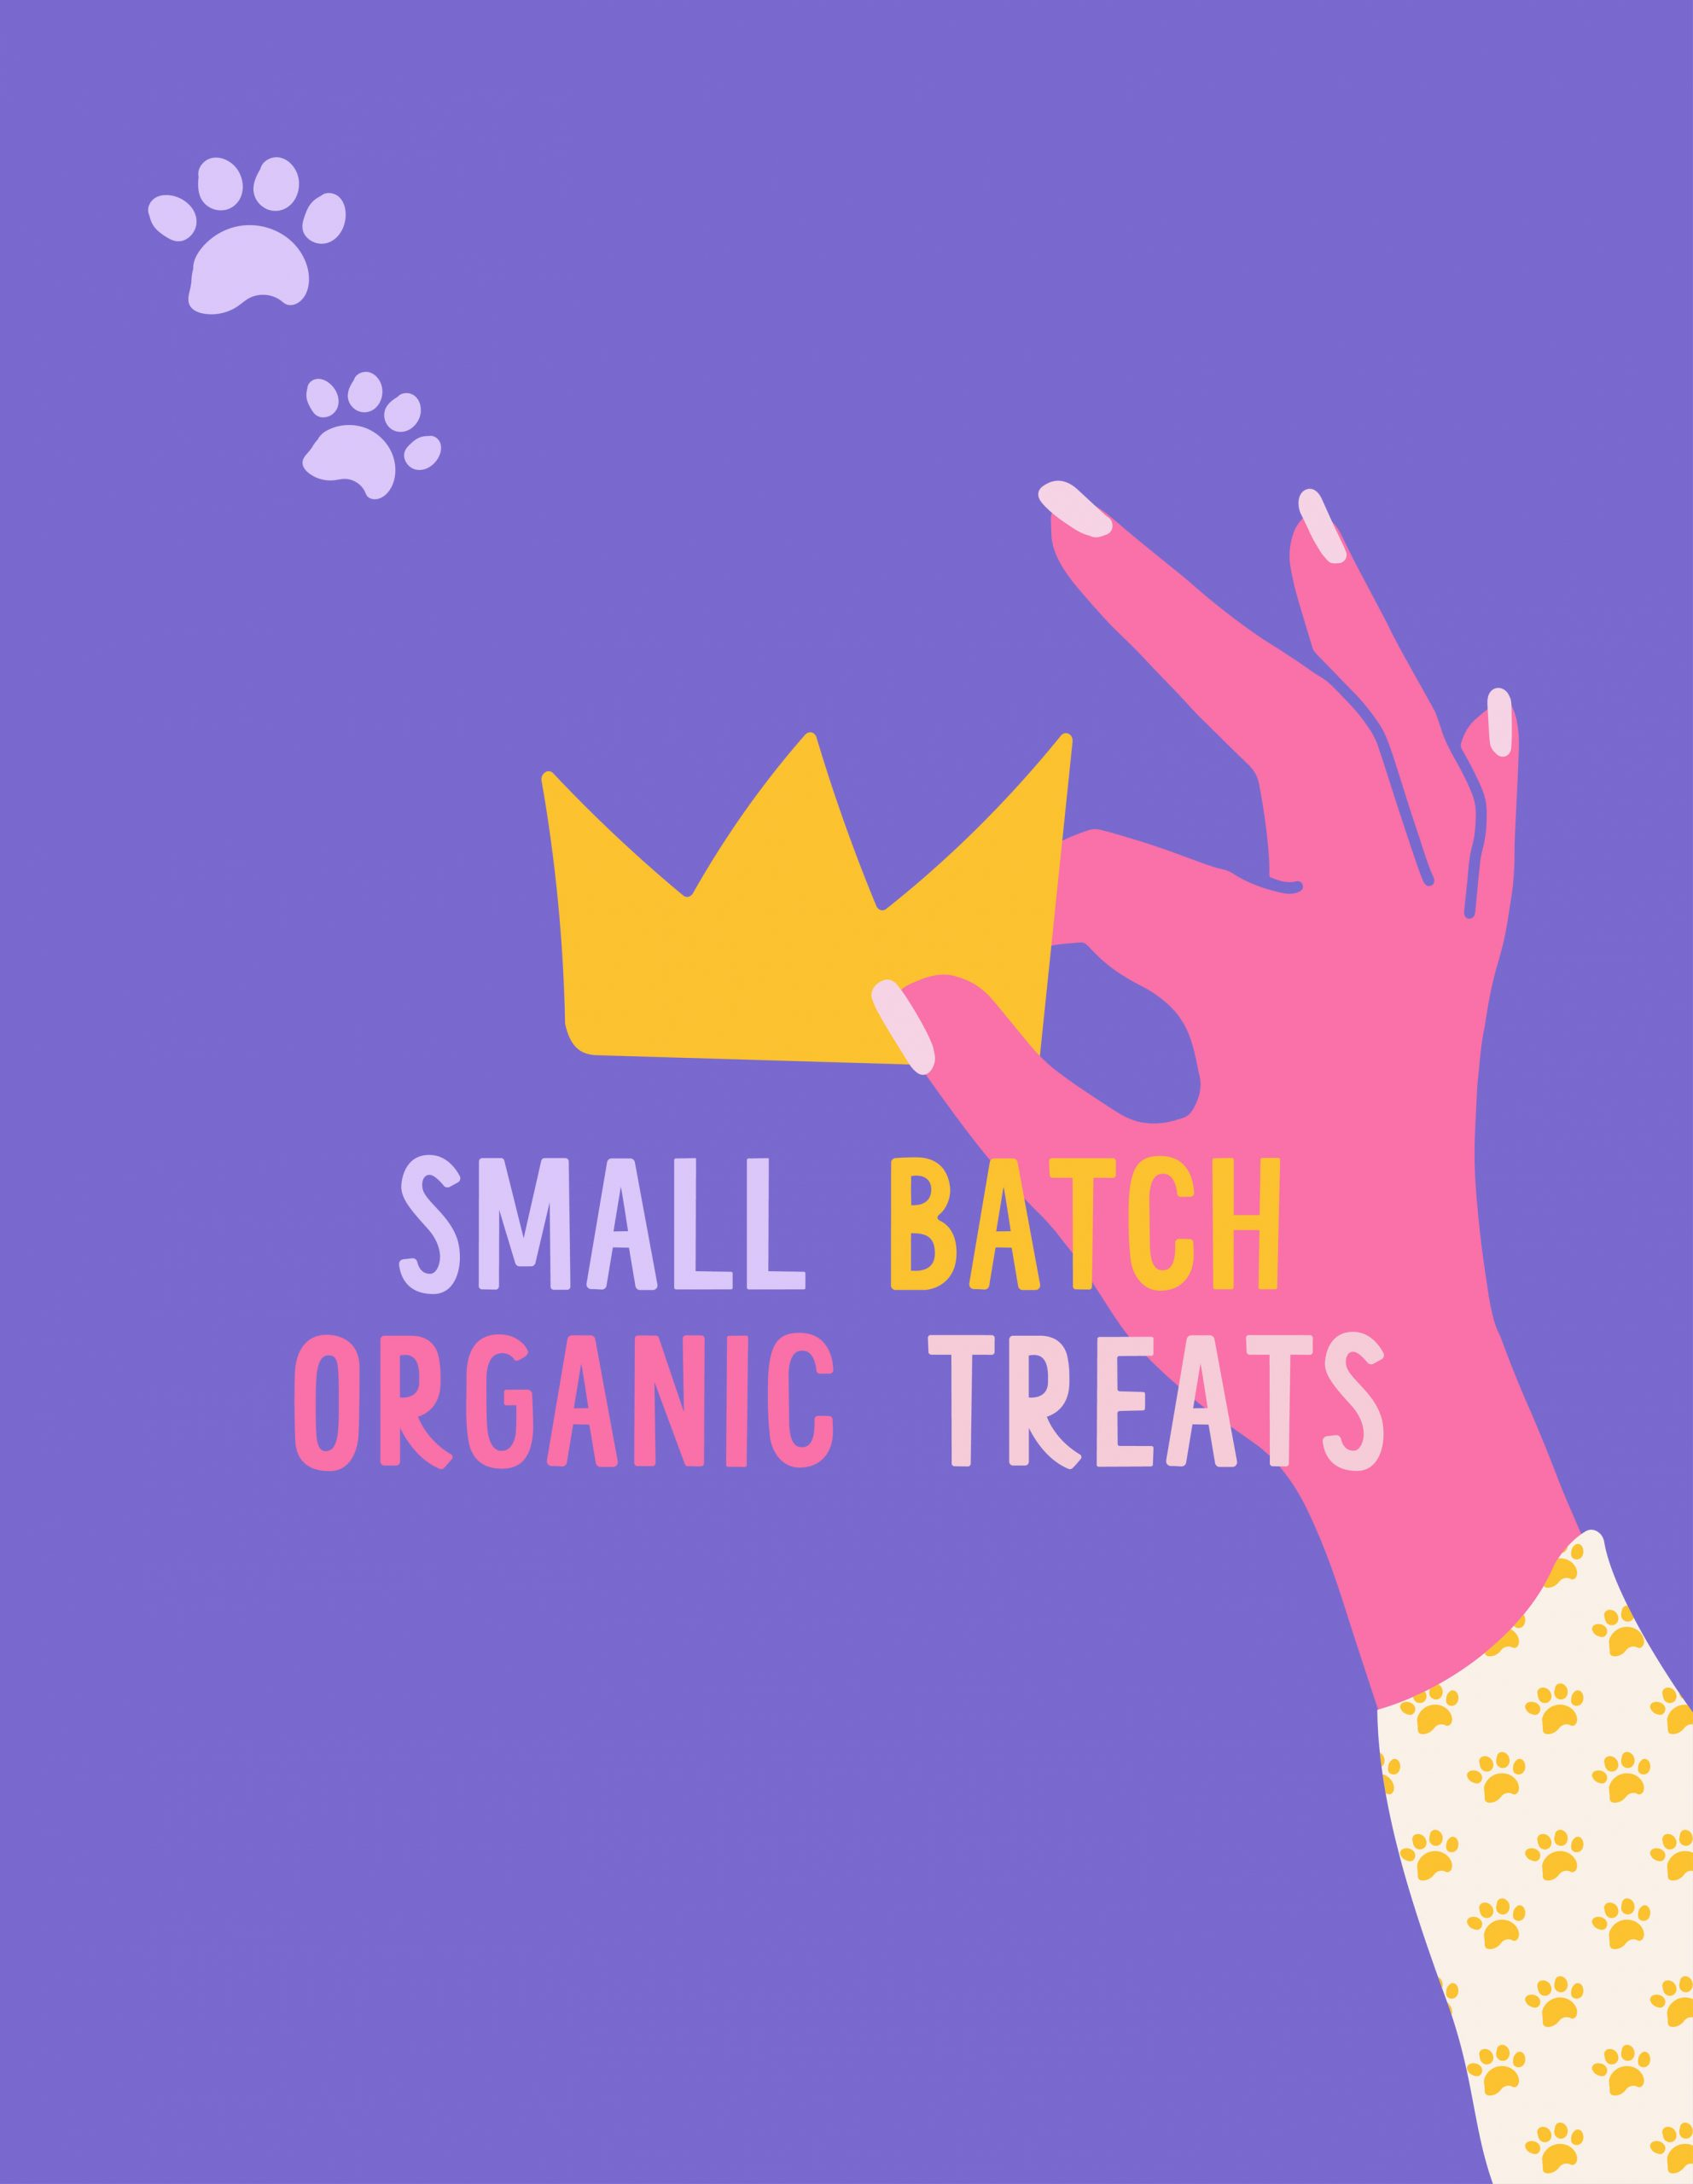 small batch organic treats flyer